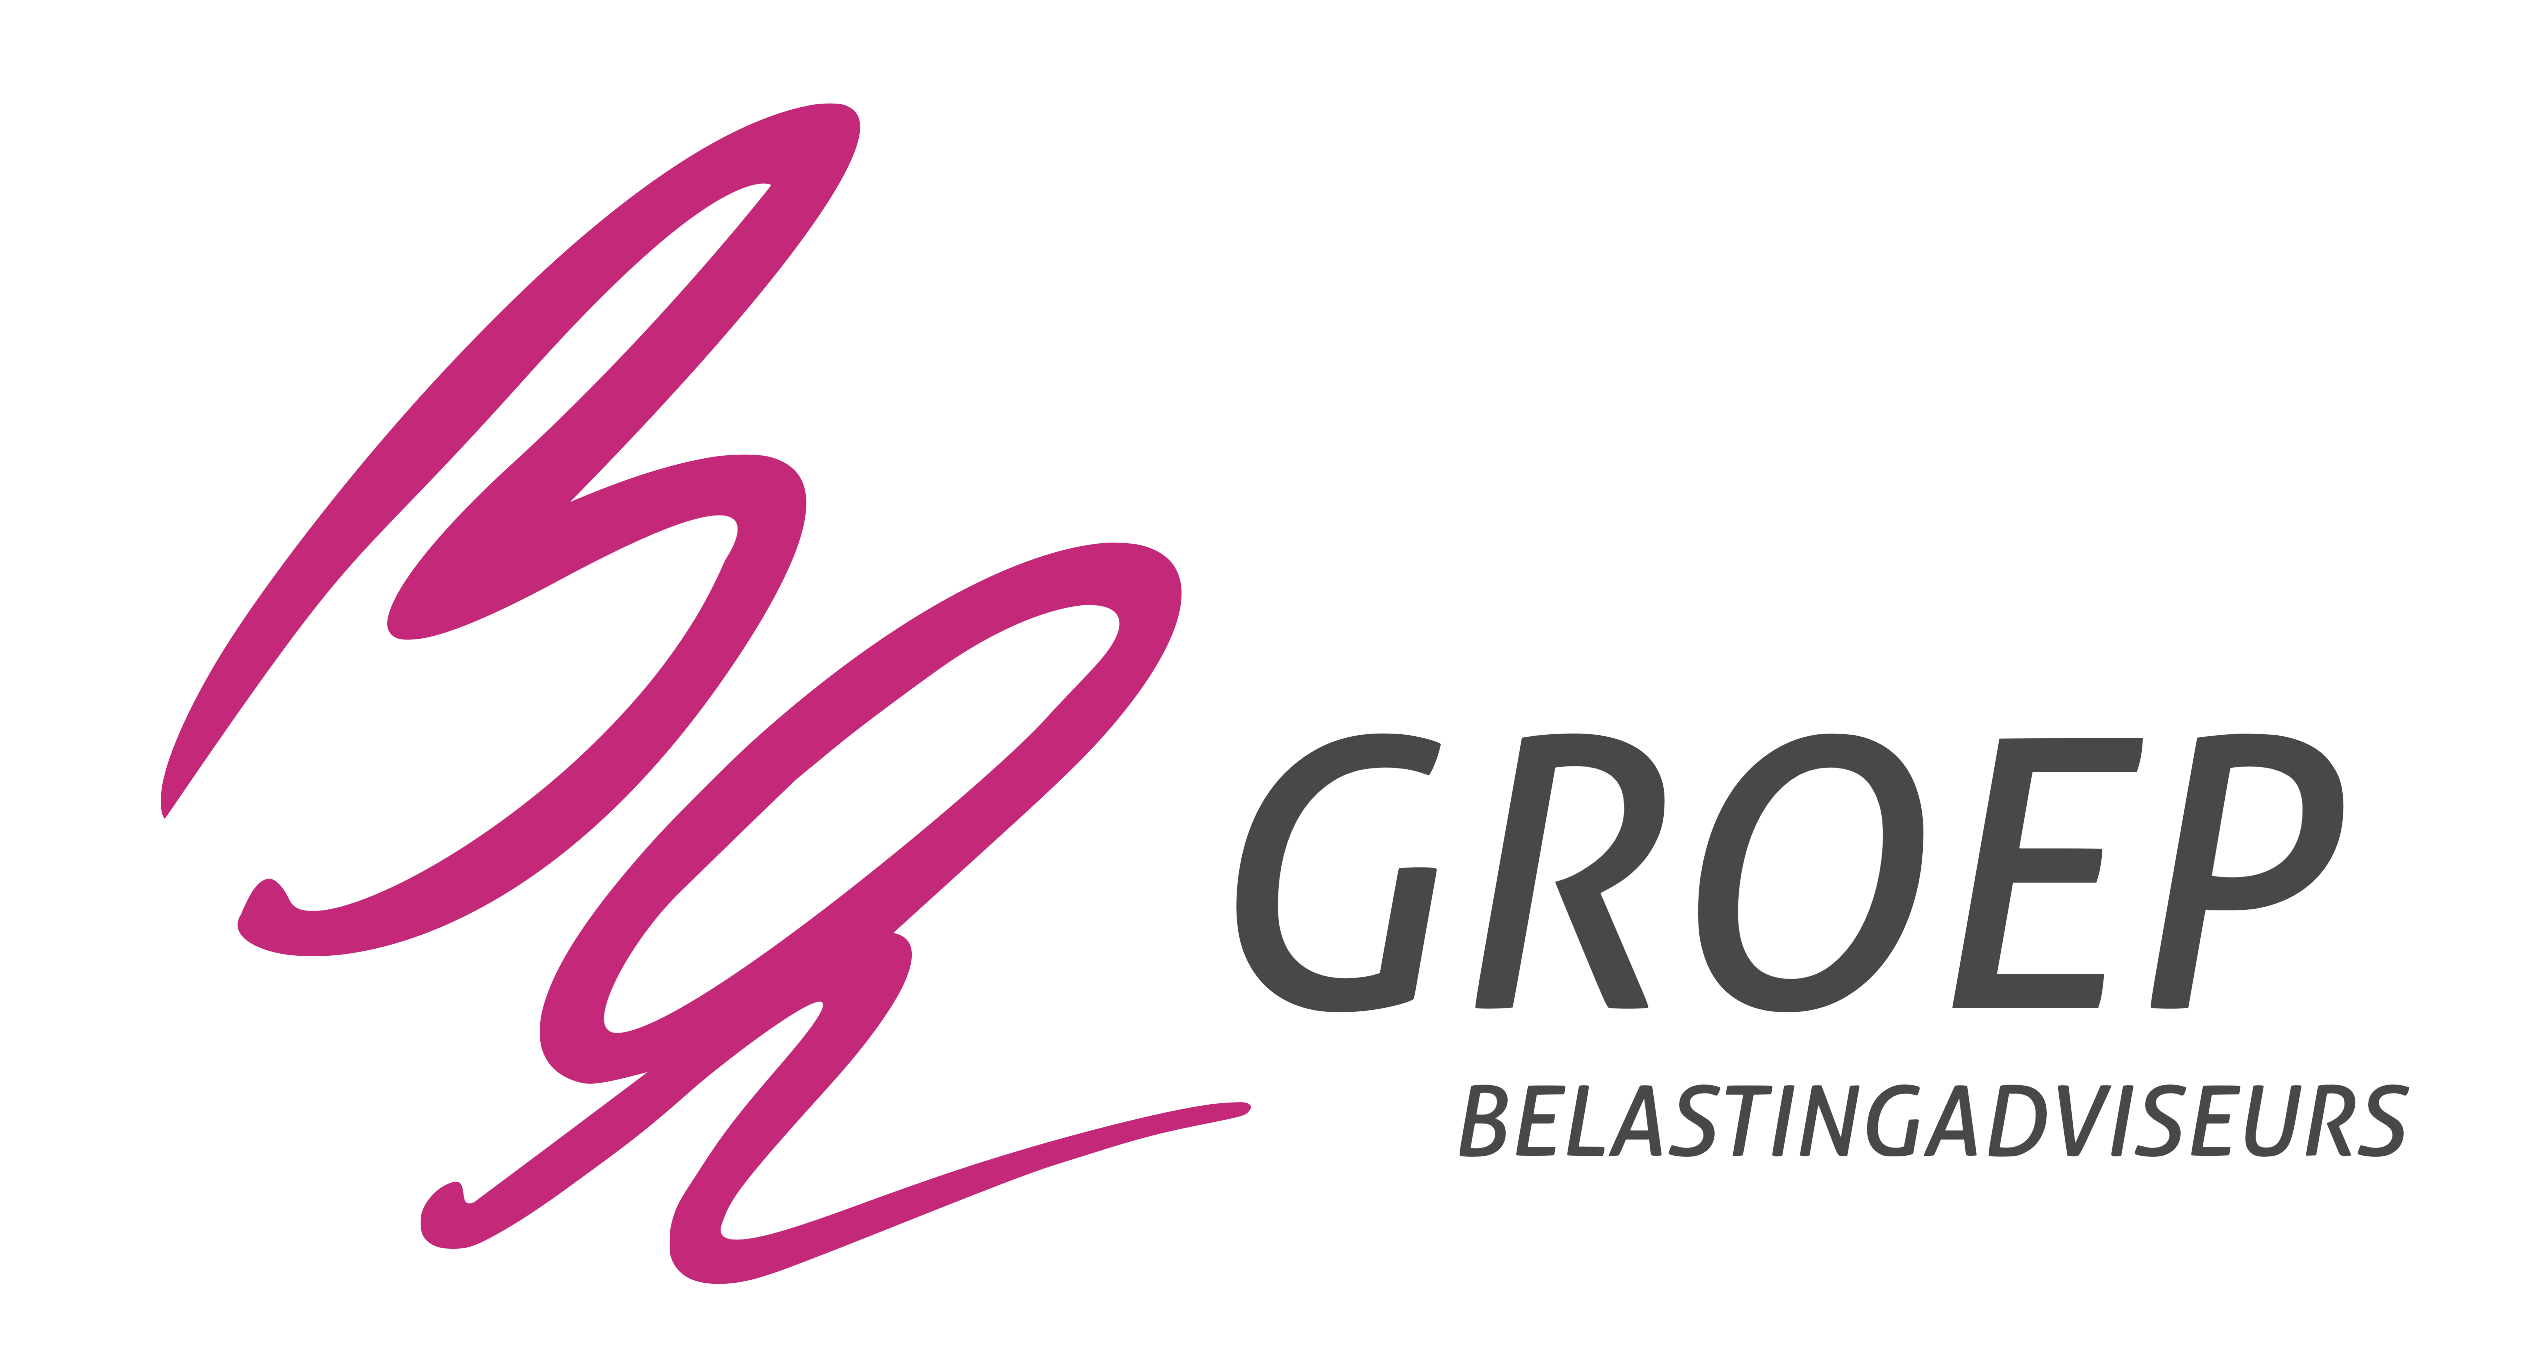 BG-GROEP